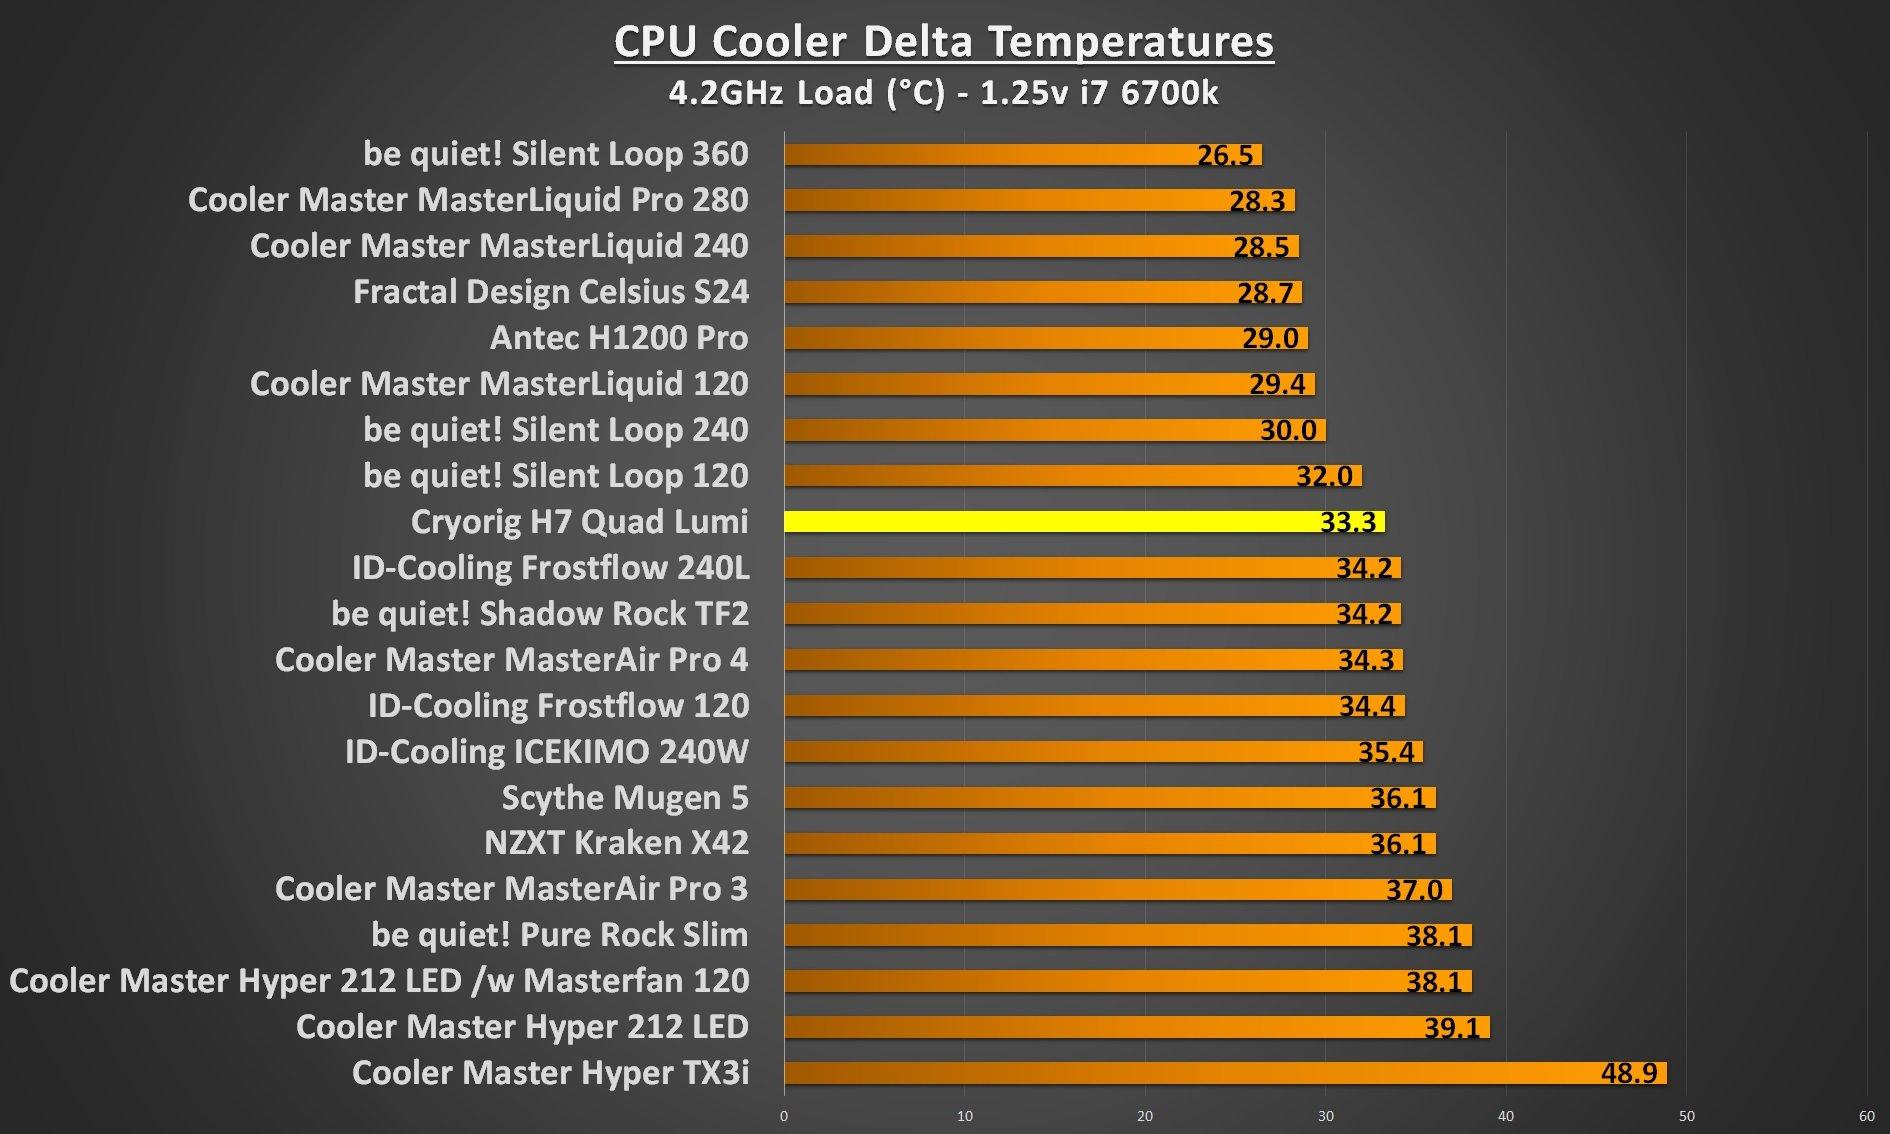 Cryorig H7 Quad Lumi 4.2Ghz load